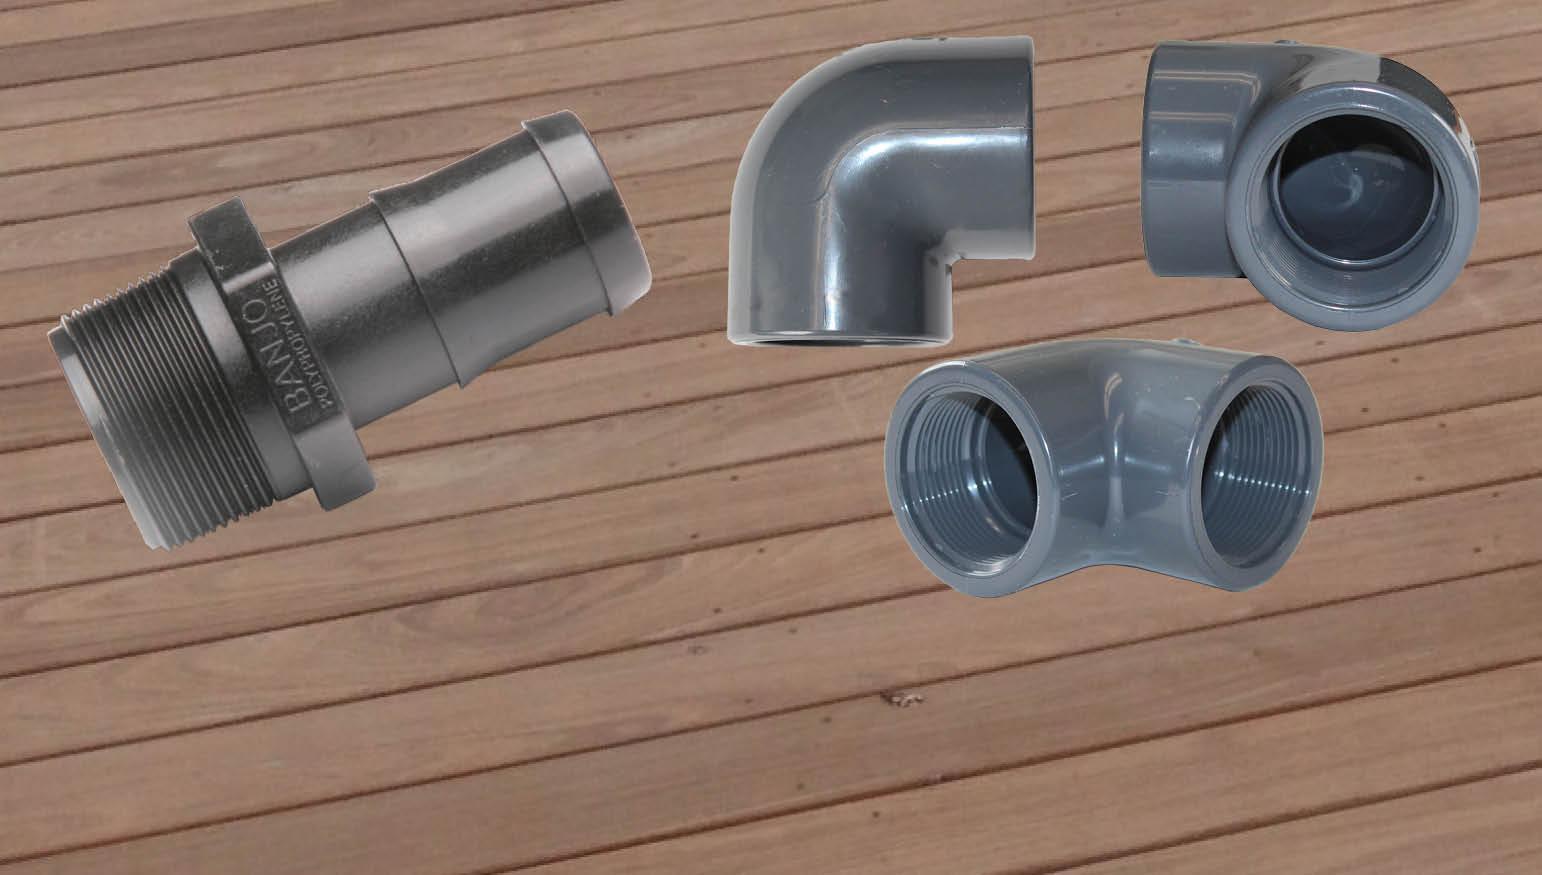 top-banner-acc-fittings-hosesfittingsacc-threaded-hose-couplings-lg-.jpg